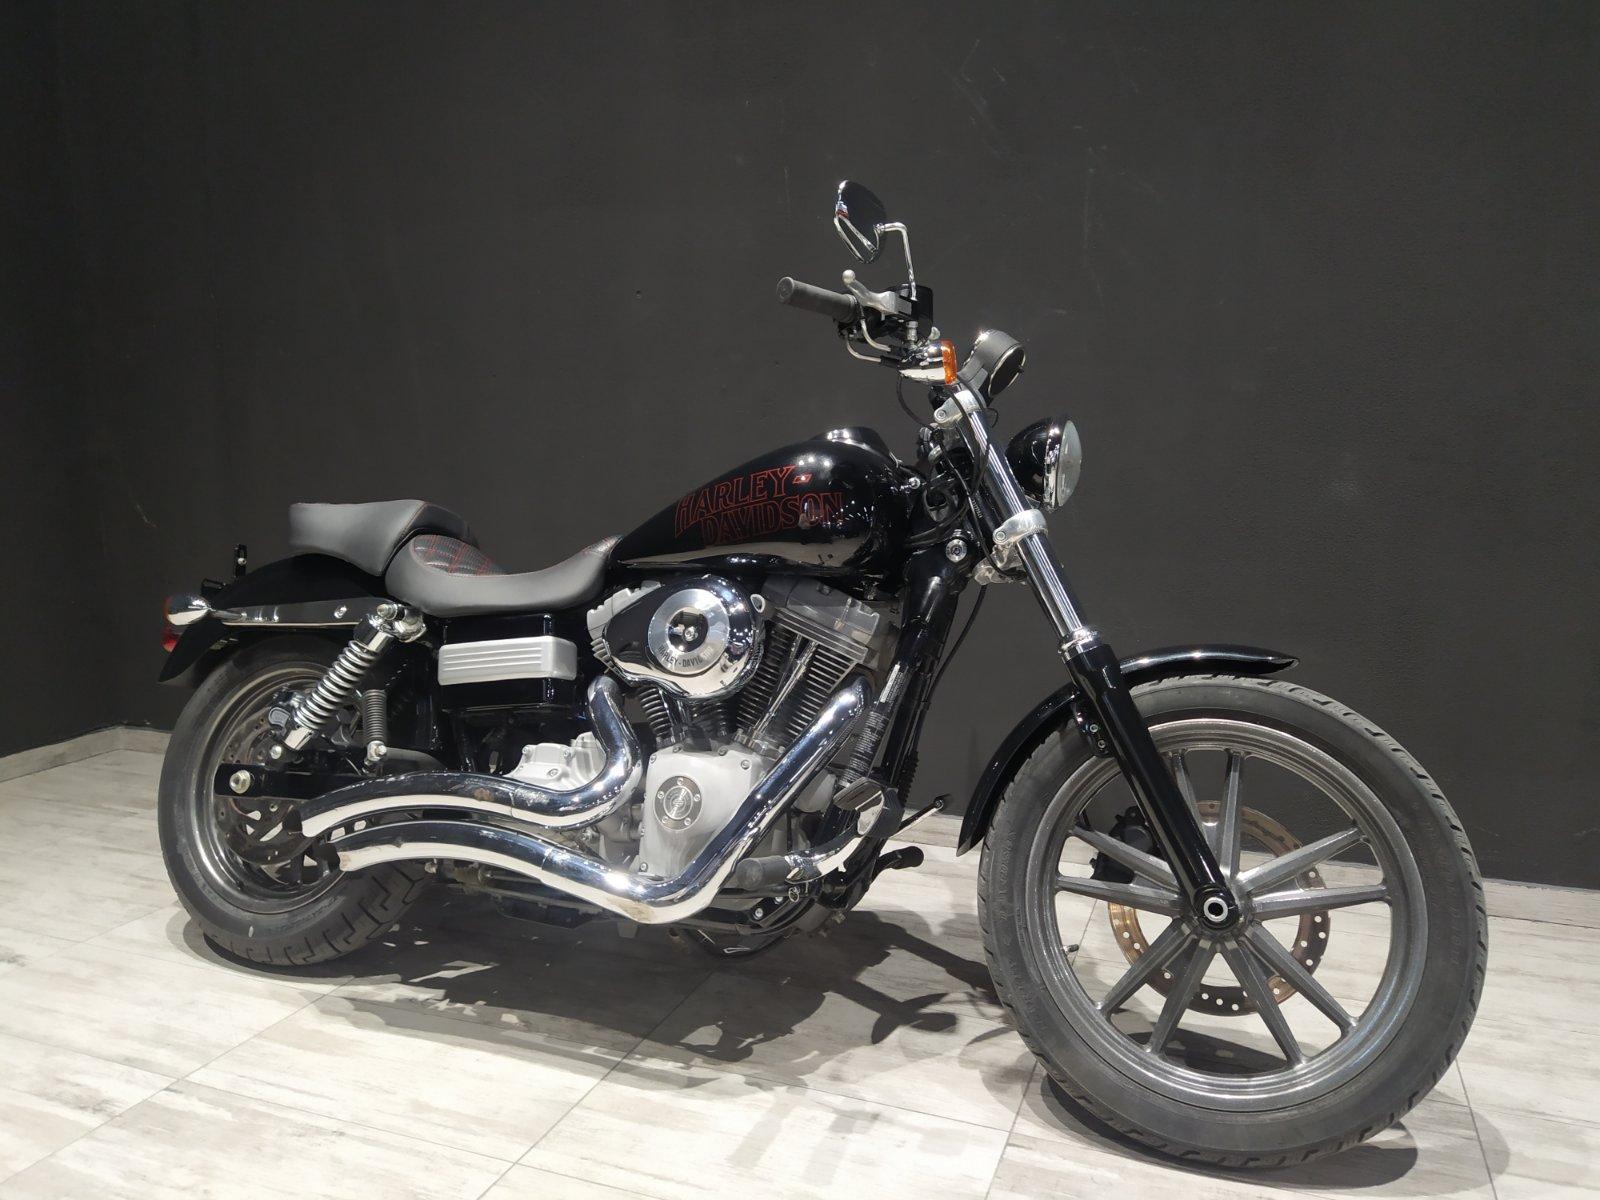 Harley-Davidson 1450 Dyna Super Glide